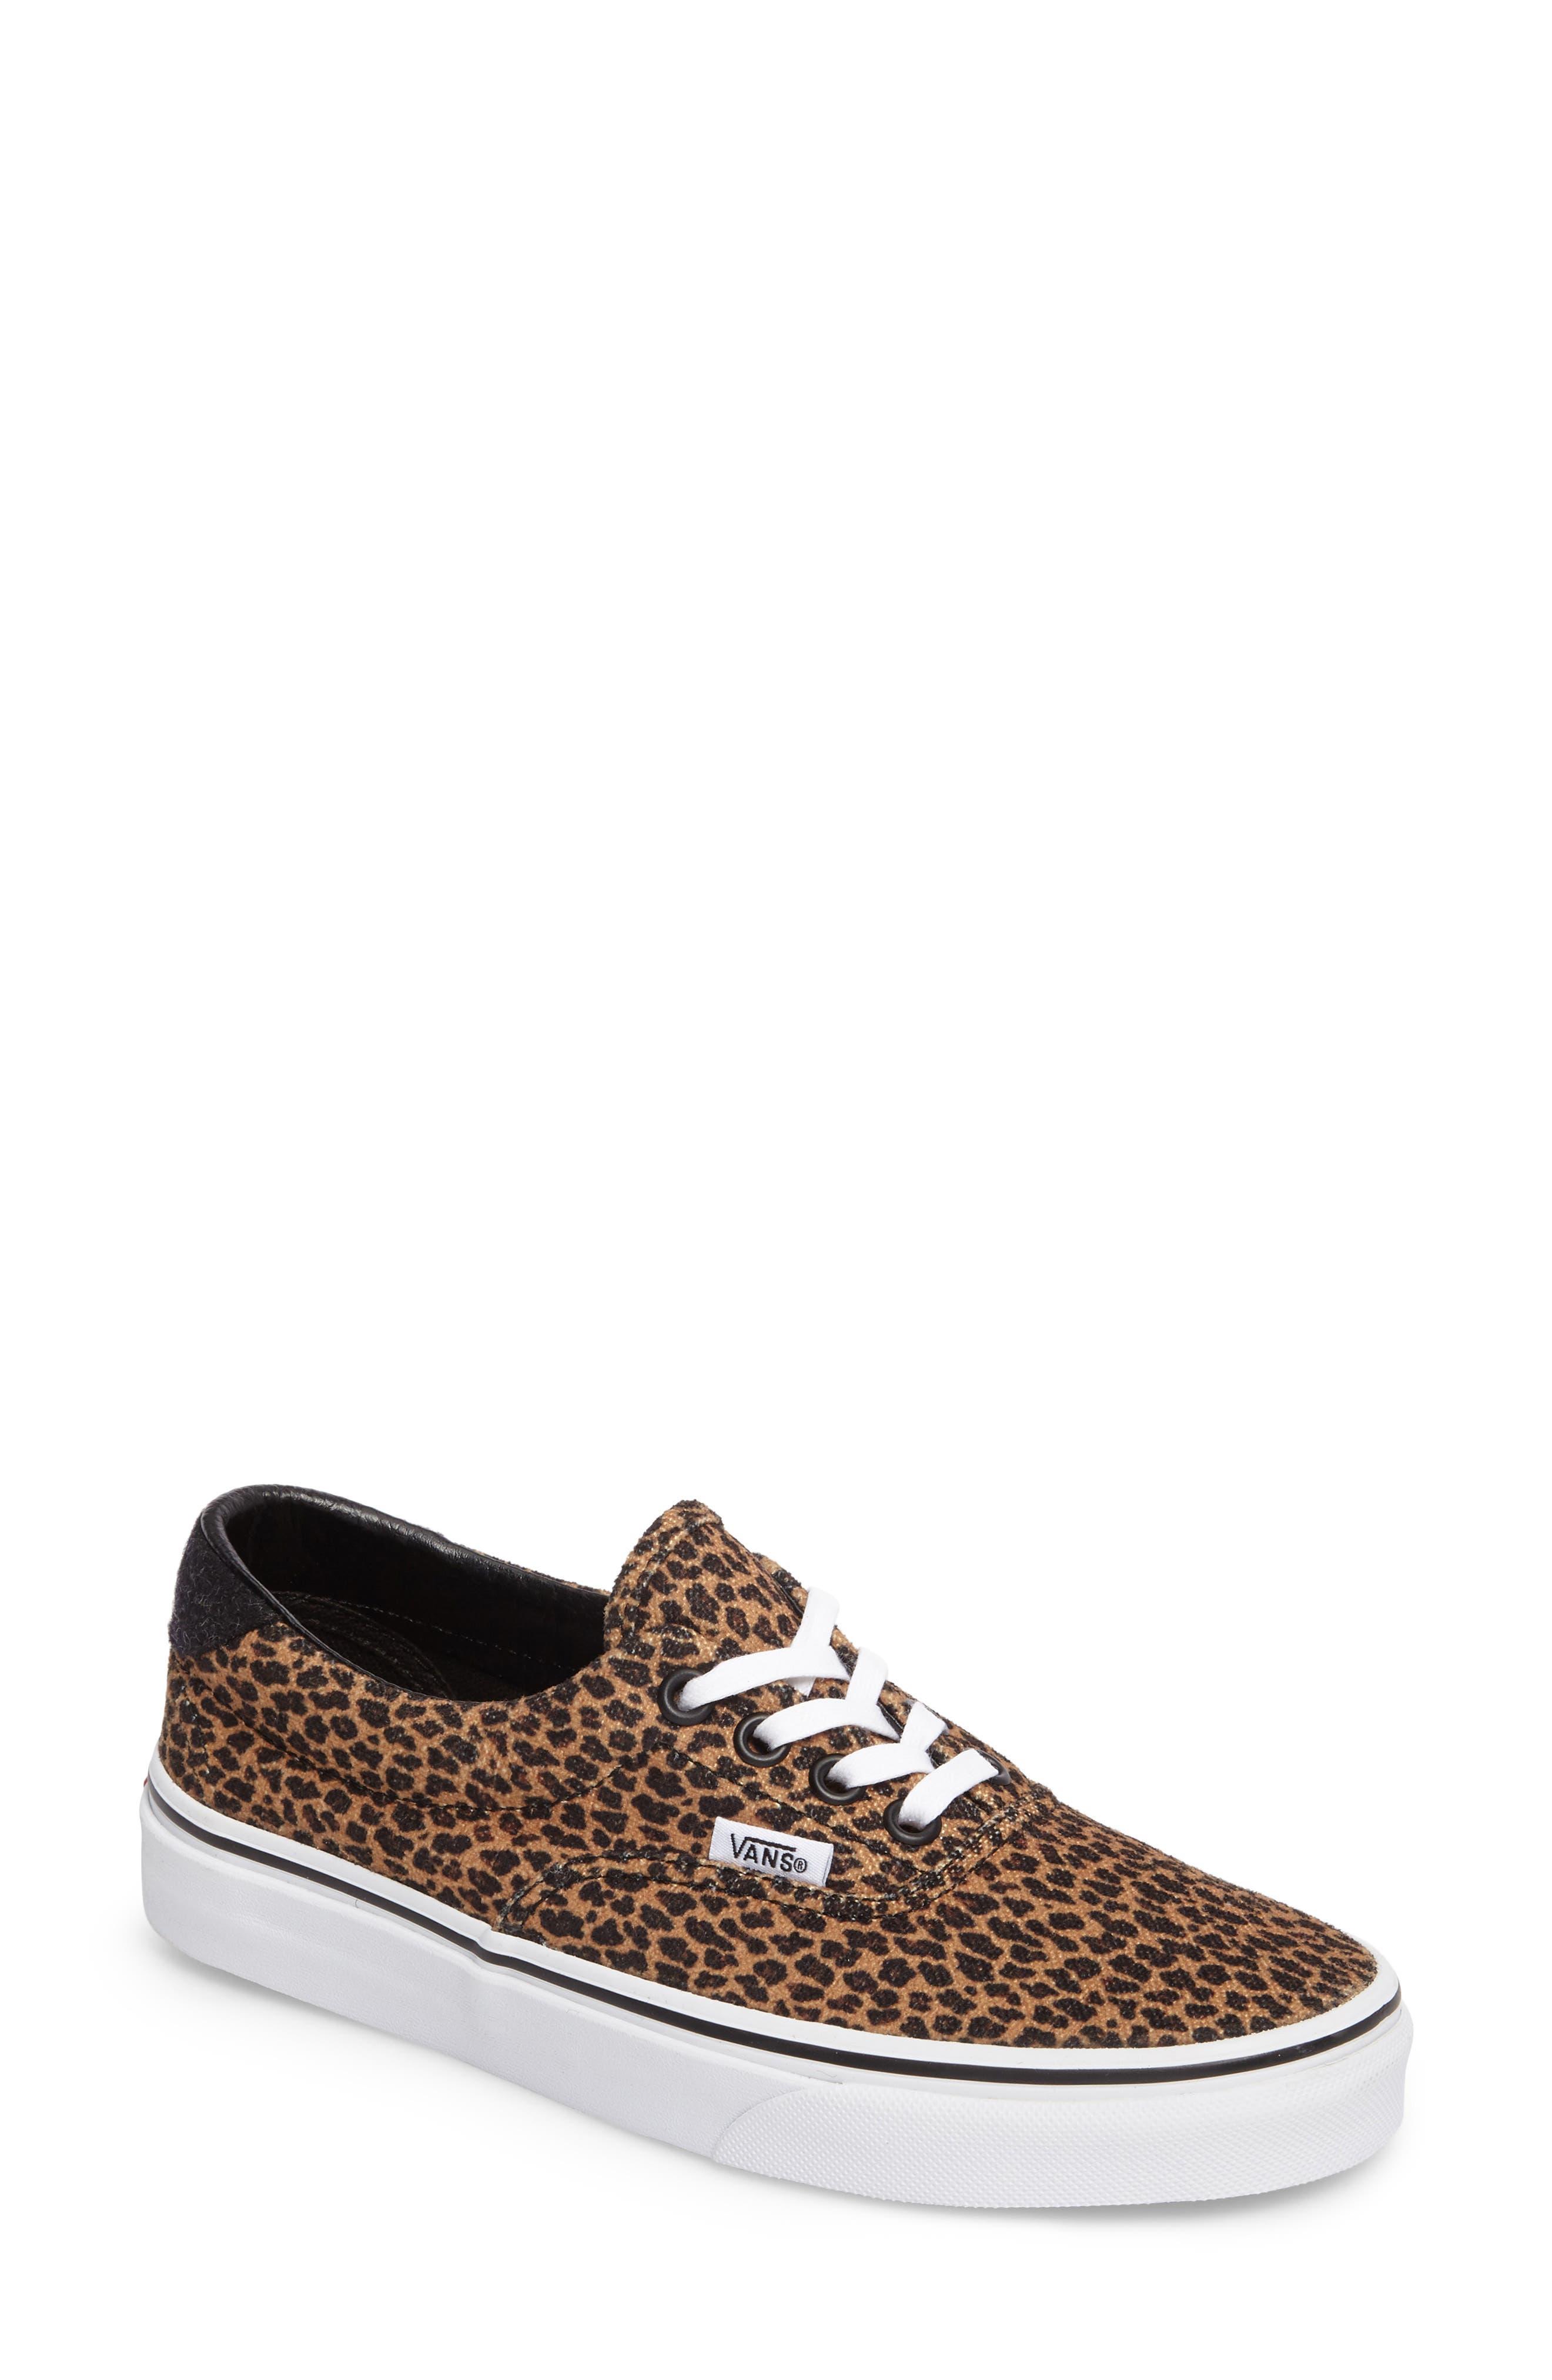 Main Image - Vans Era 59 Sneaker (Women)